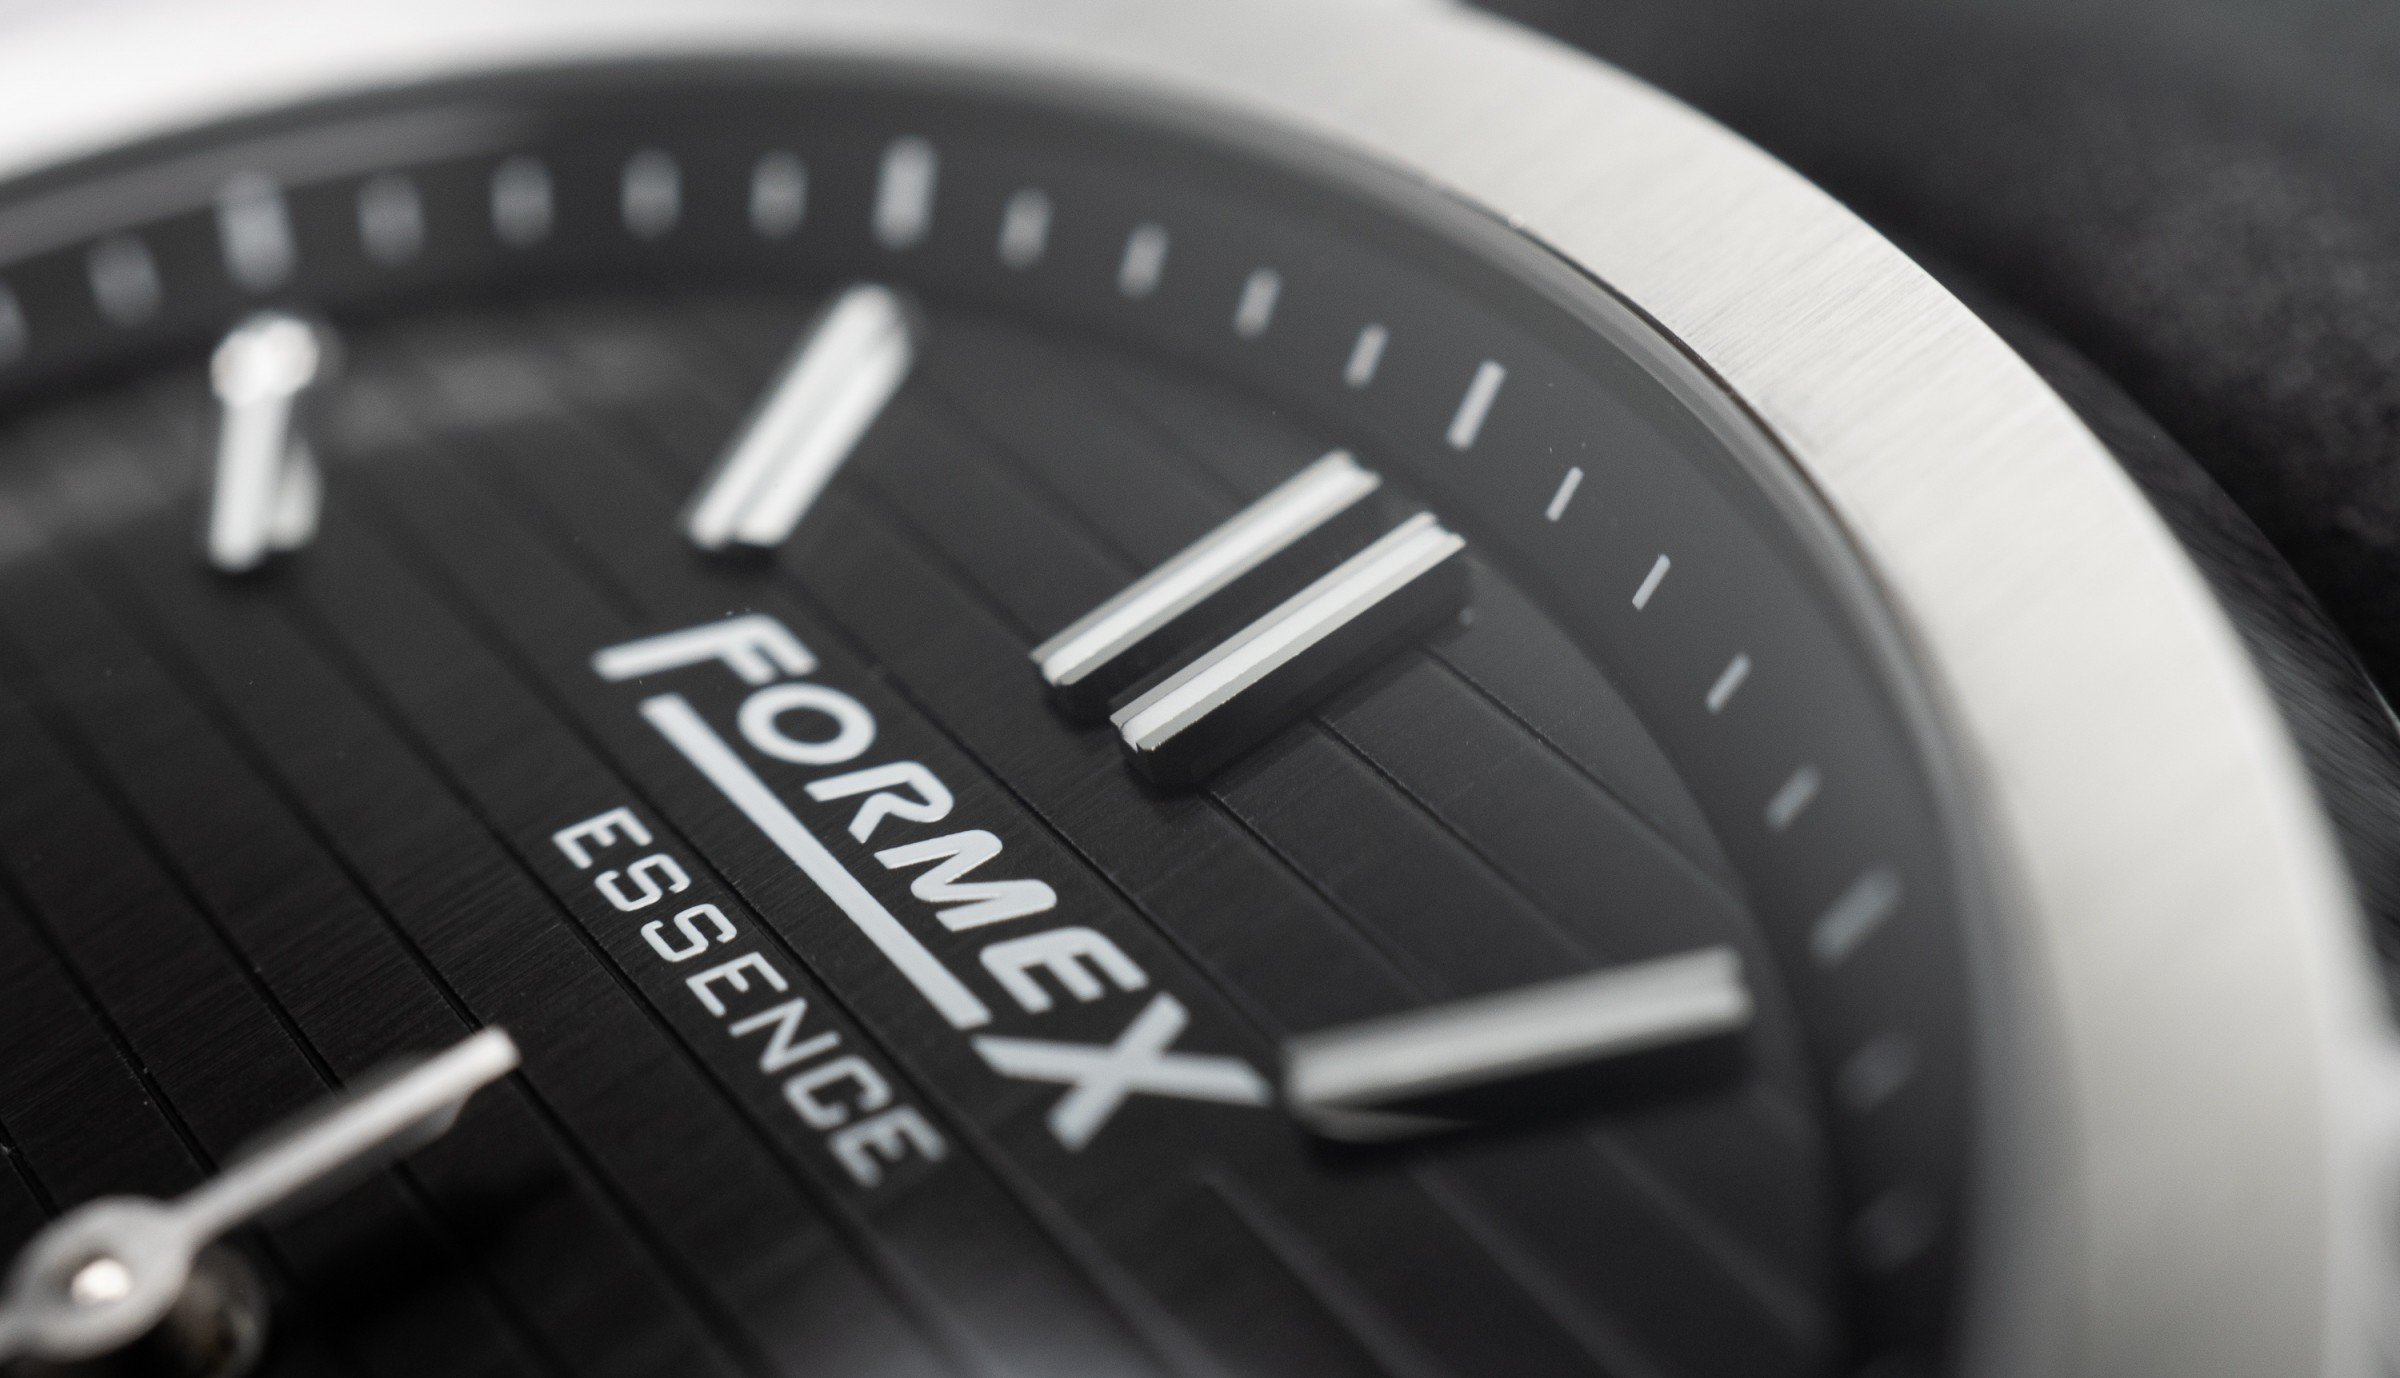 FORMEX Essence Automatic Chronometre Kickstarter